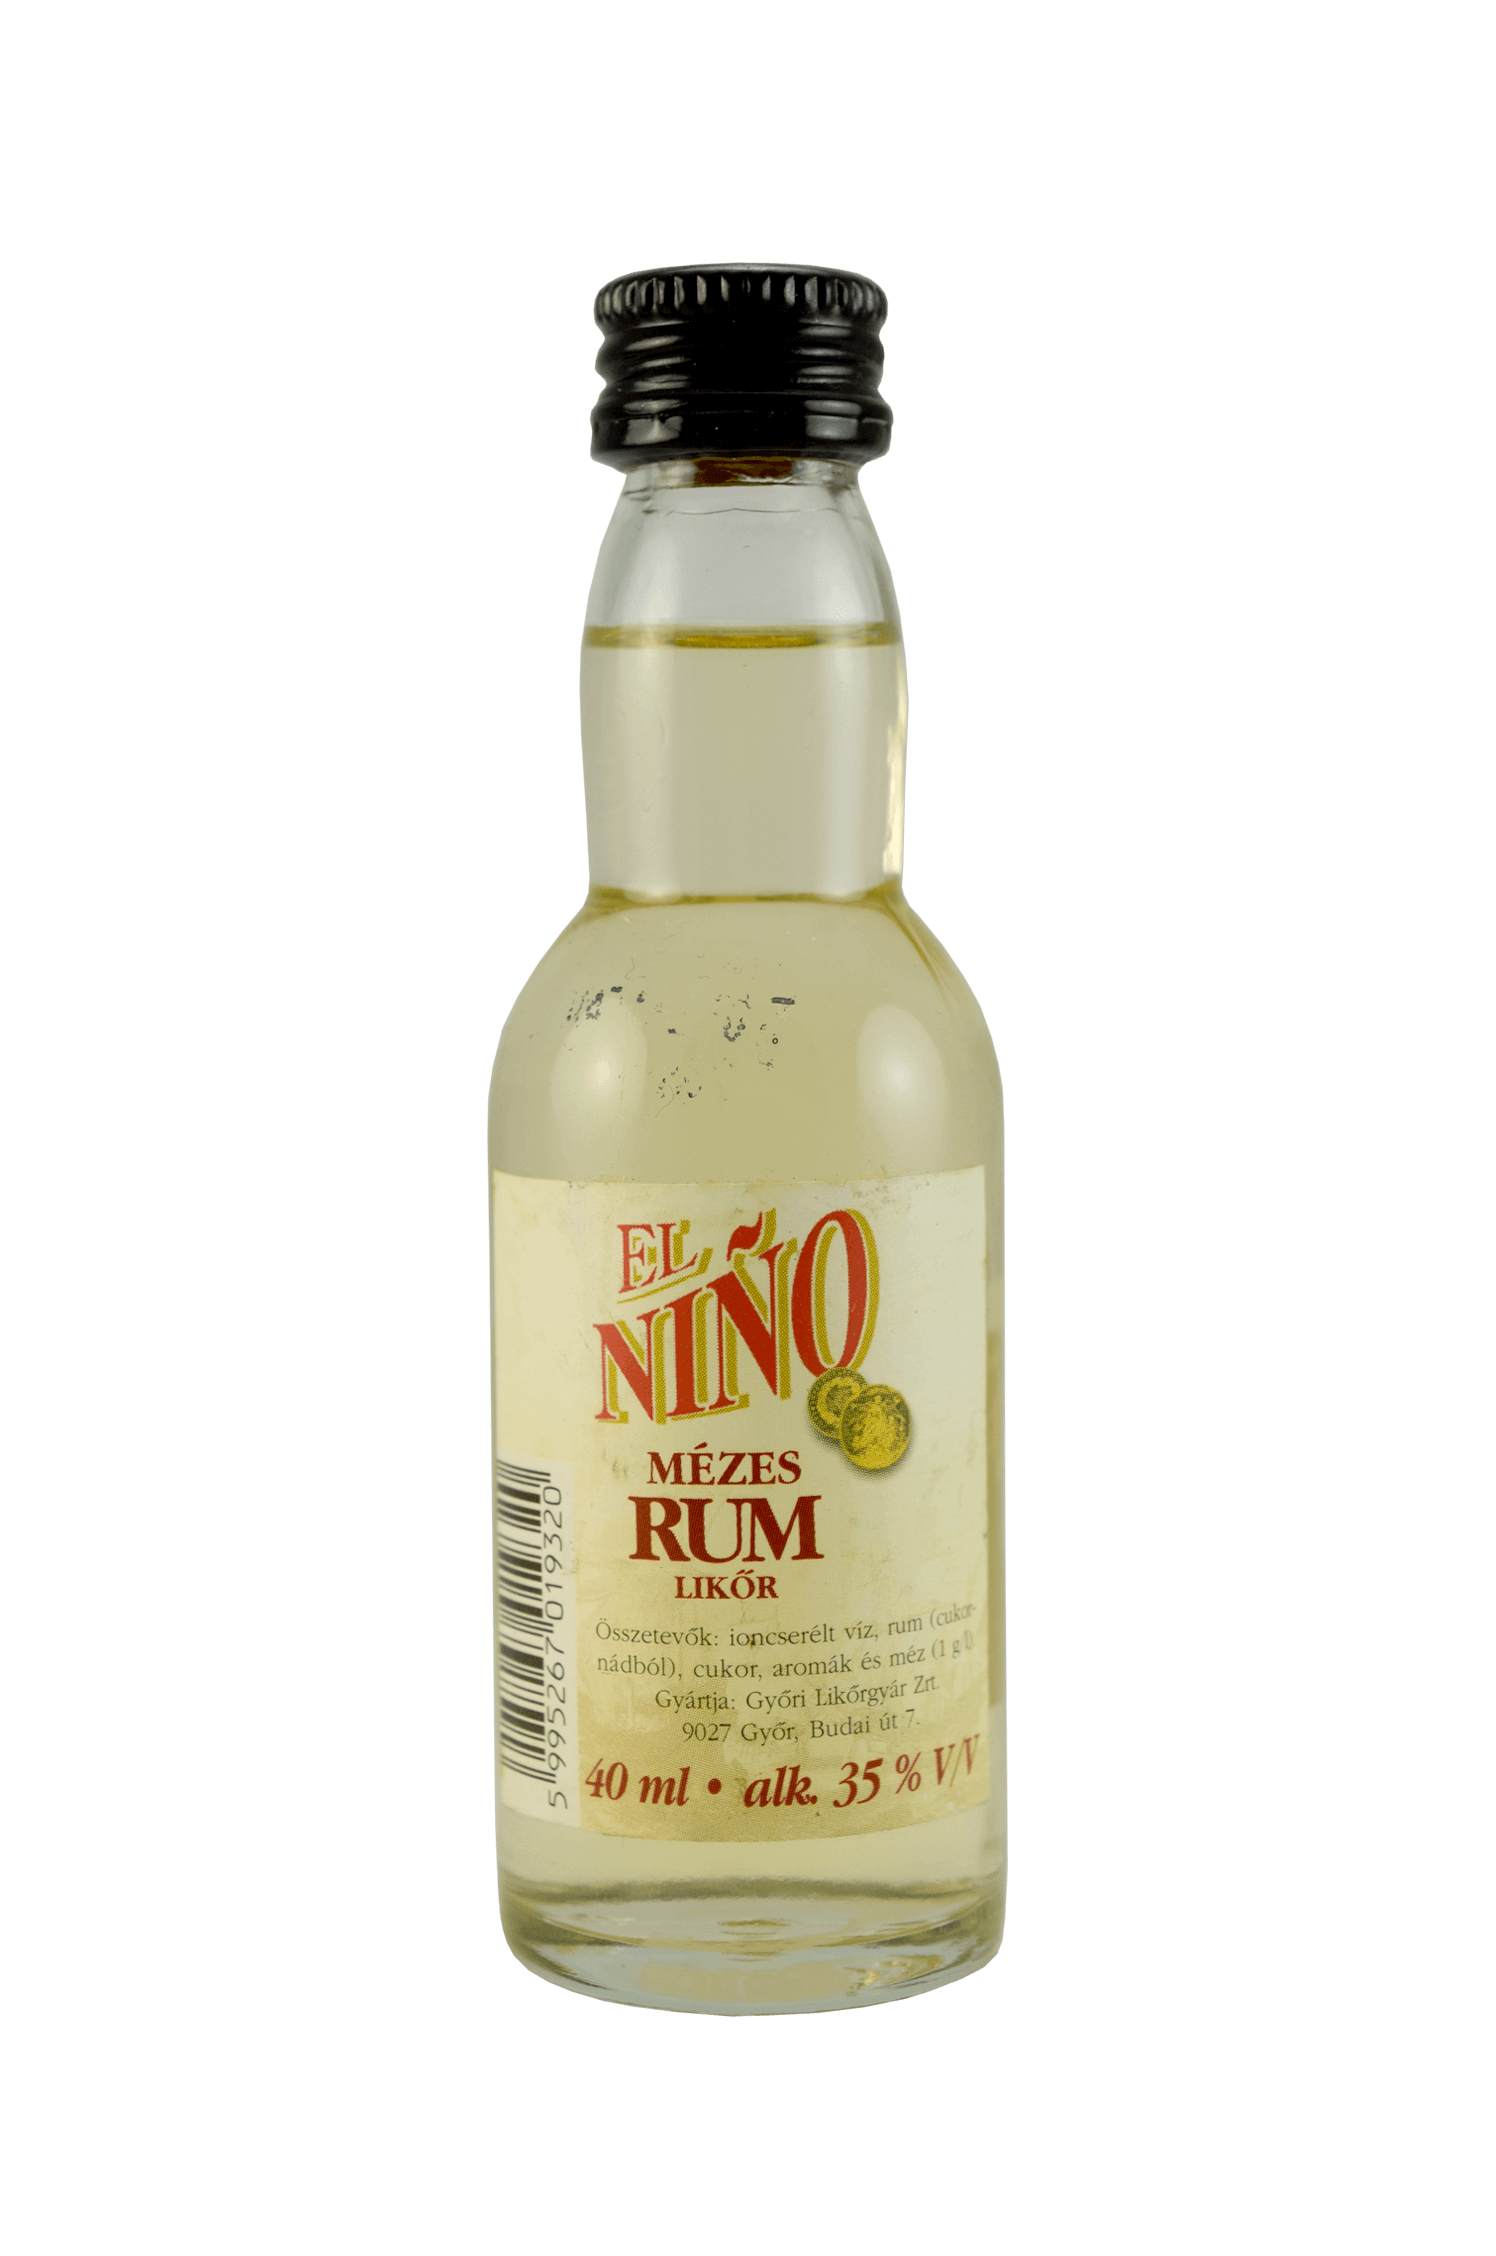 El Niňo Mézes Rum Likör